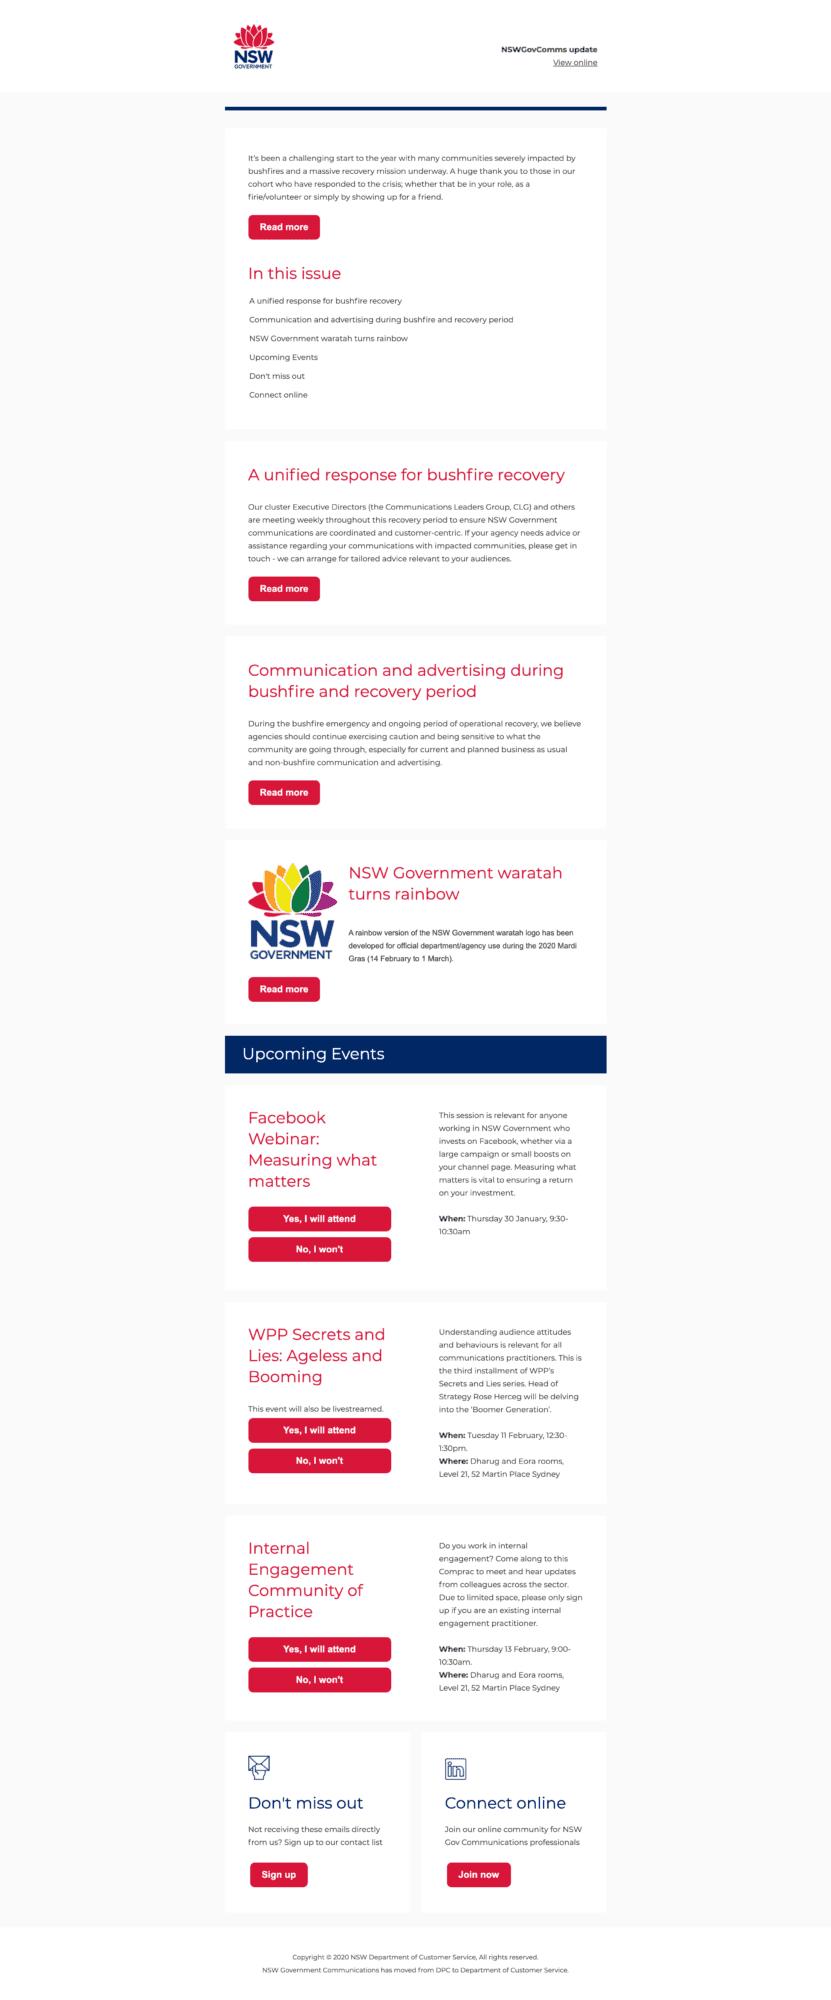 Customer Service NSW Newsletter